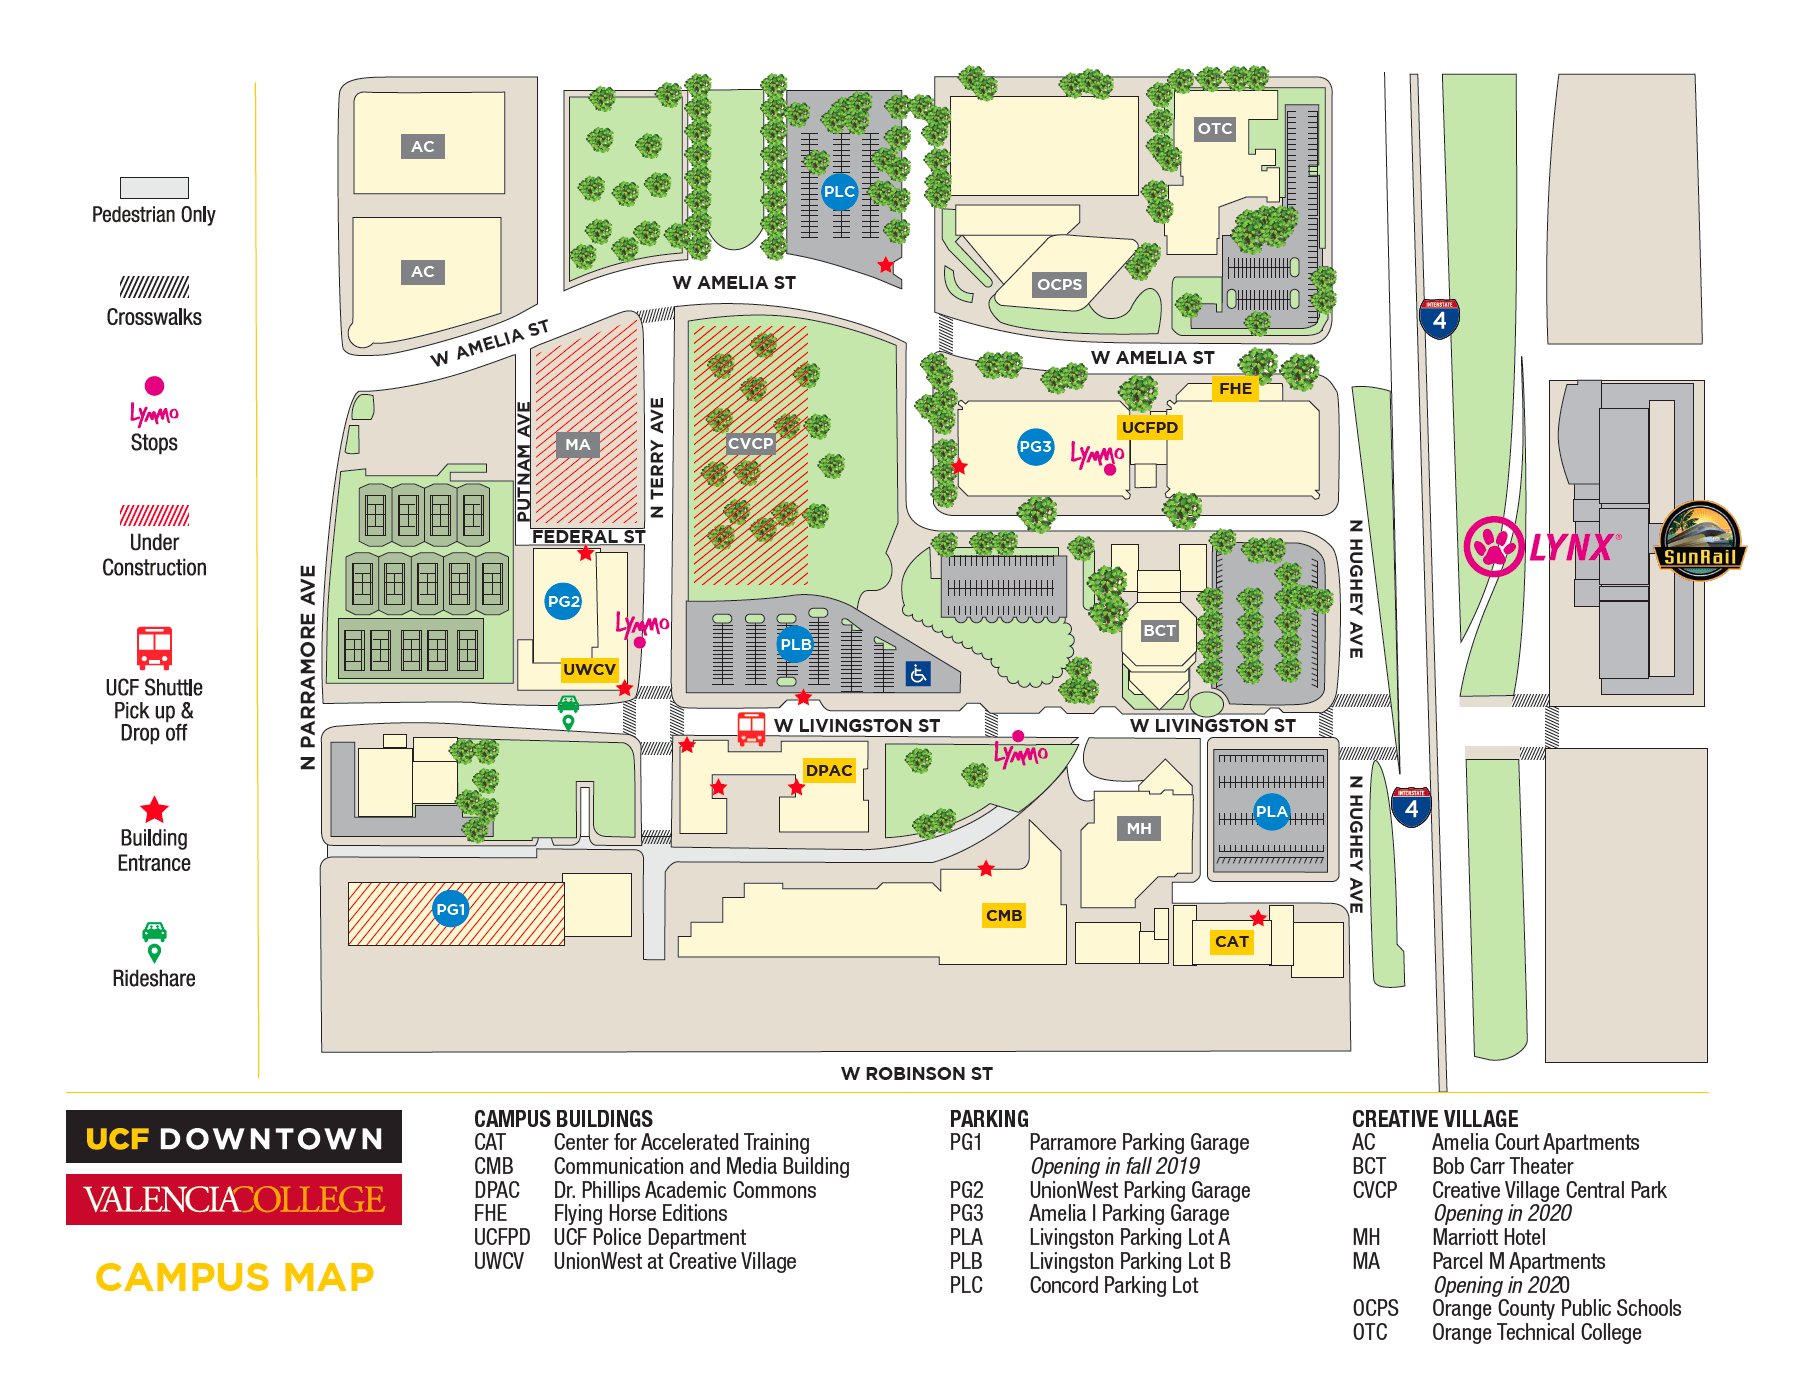 Current UCF parking map